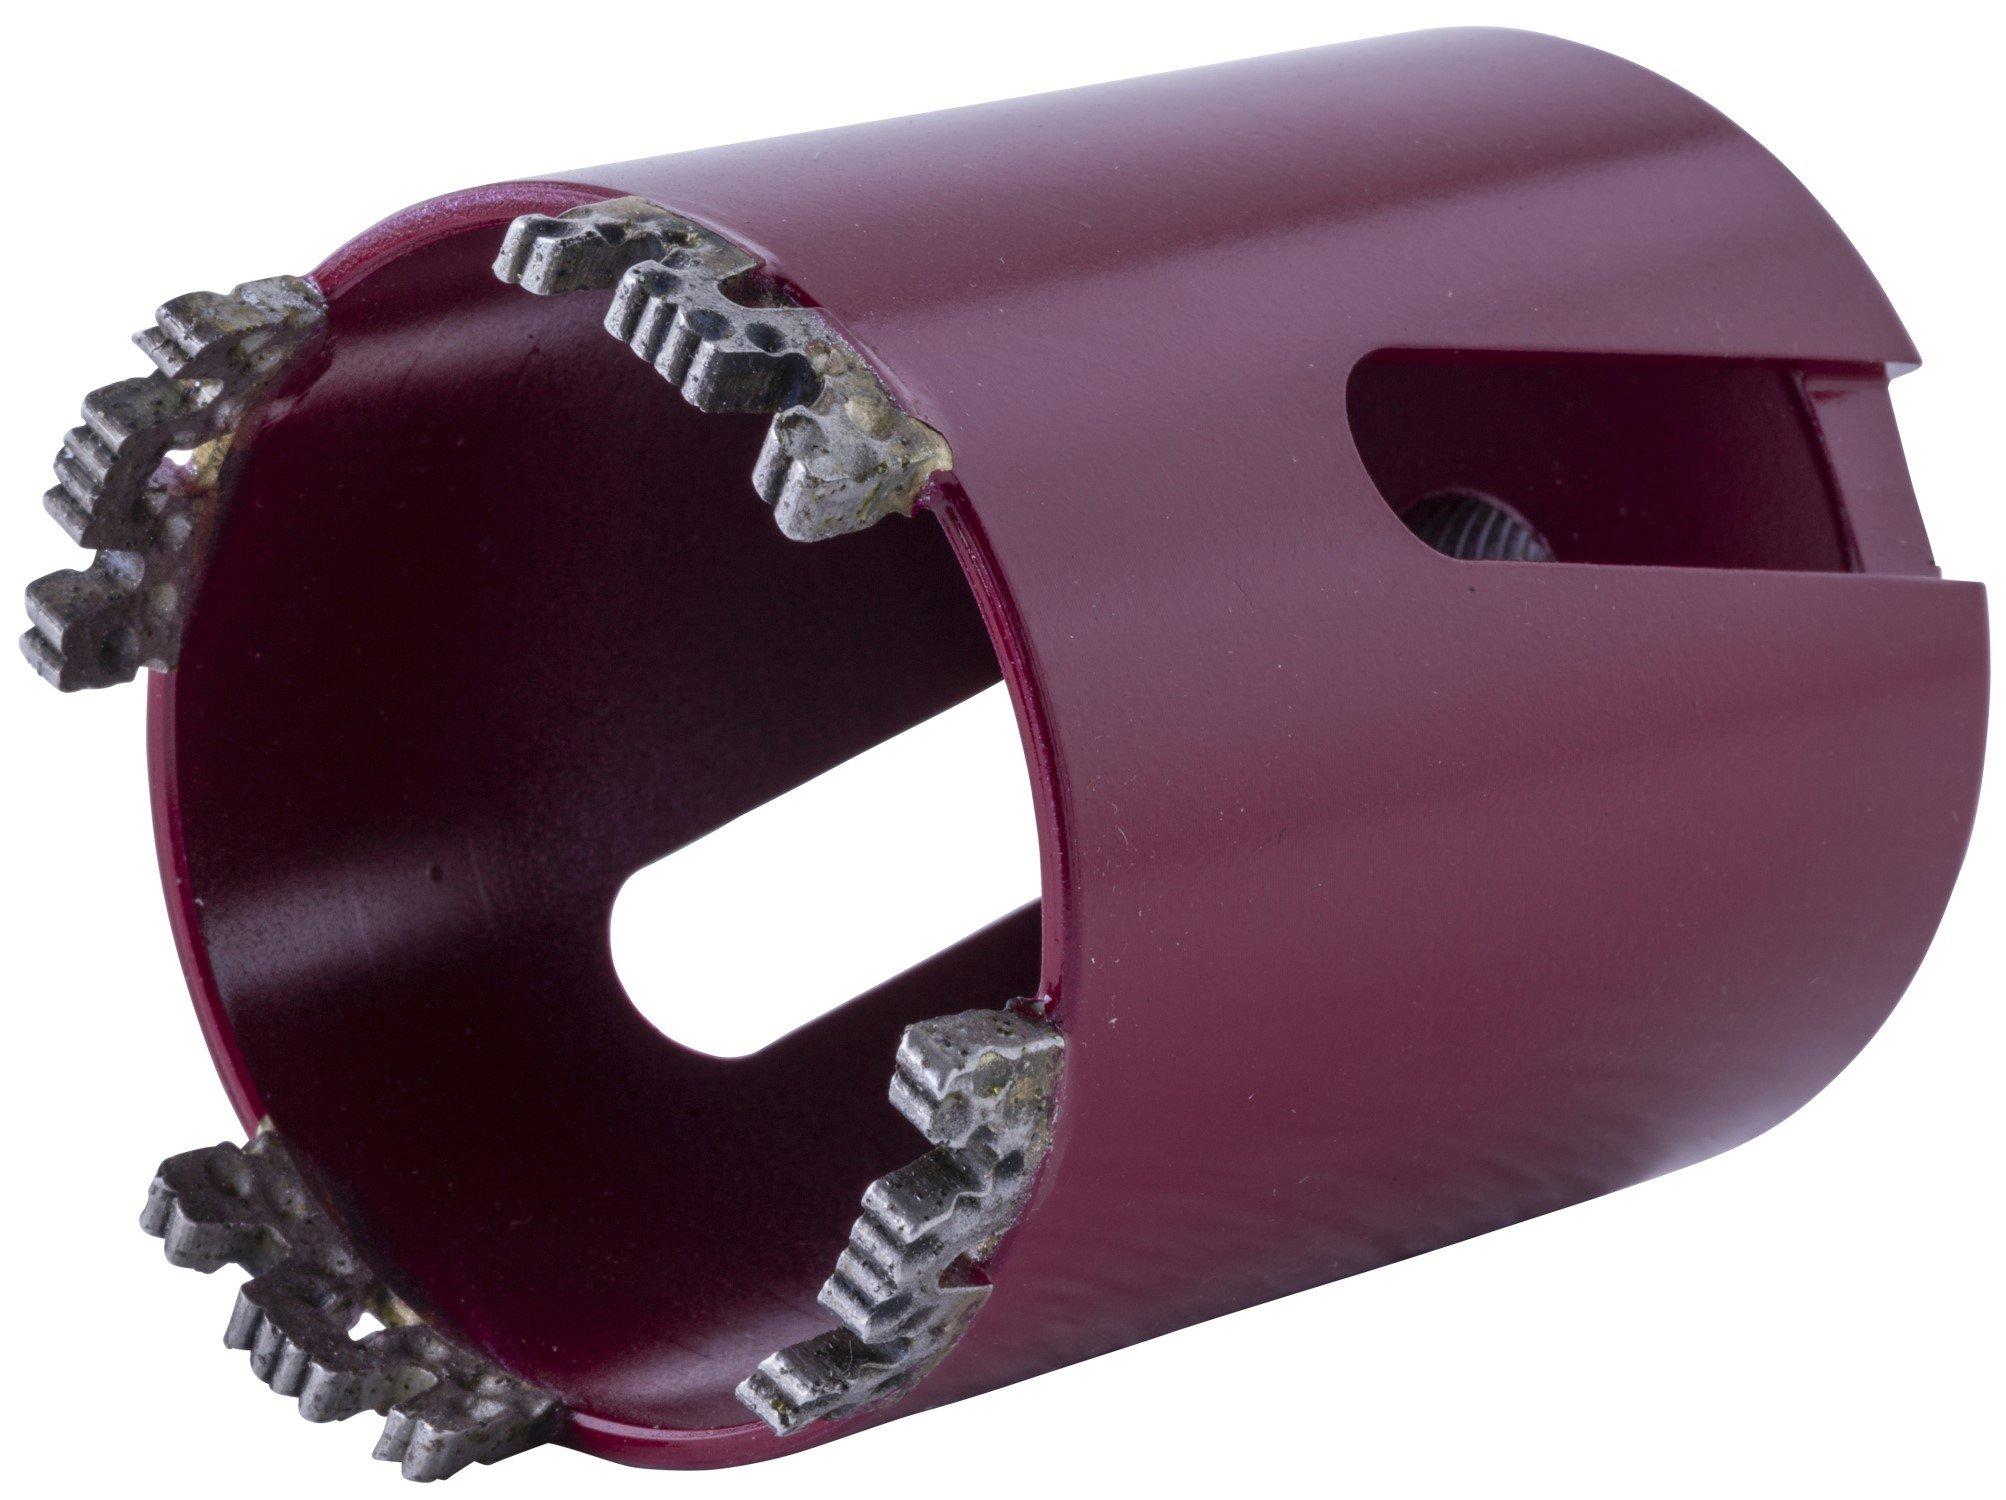 Eibenstock-Trockenbohrmaschine-EHD1500-inkl-Diamant-Dosensenker-Titan-W-Adapter-Zentrierbohrer